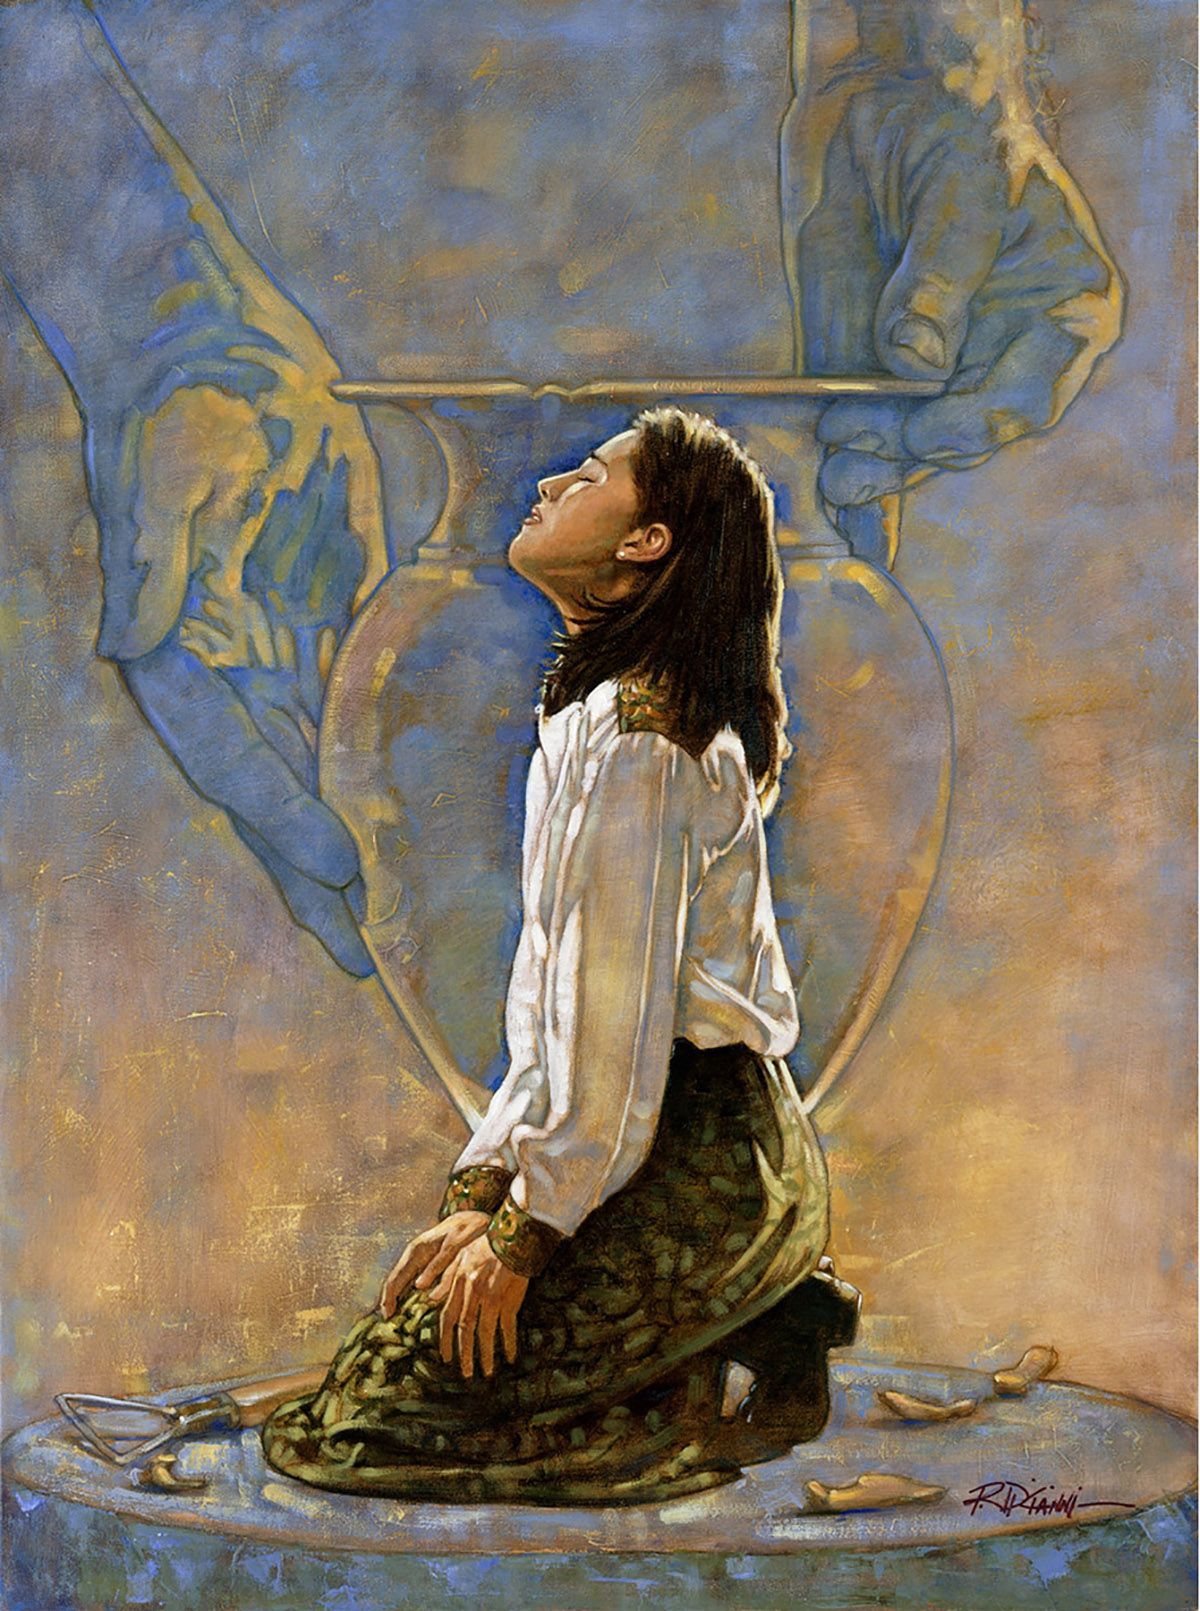 The Clay Artwork By Ron Dicianni Arte Jesus Pintura De Jesus E